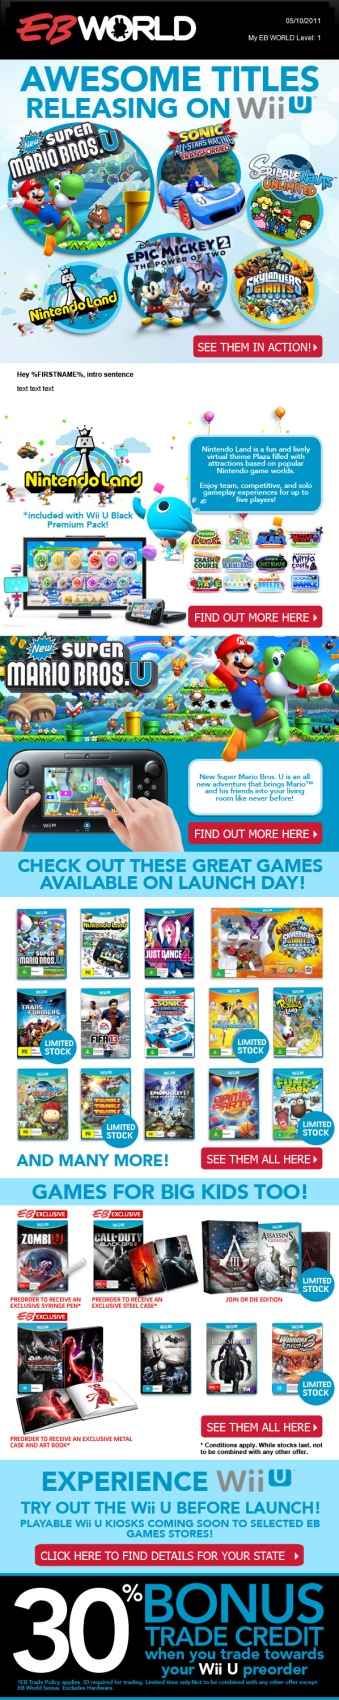 Nintendo WiiU launch edm